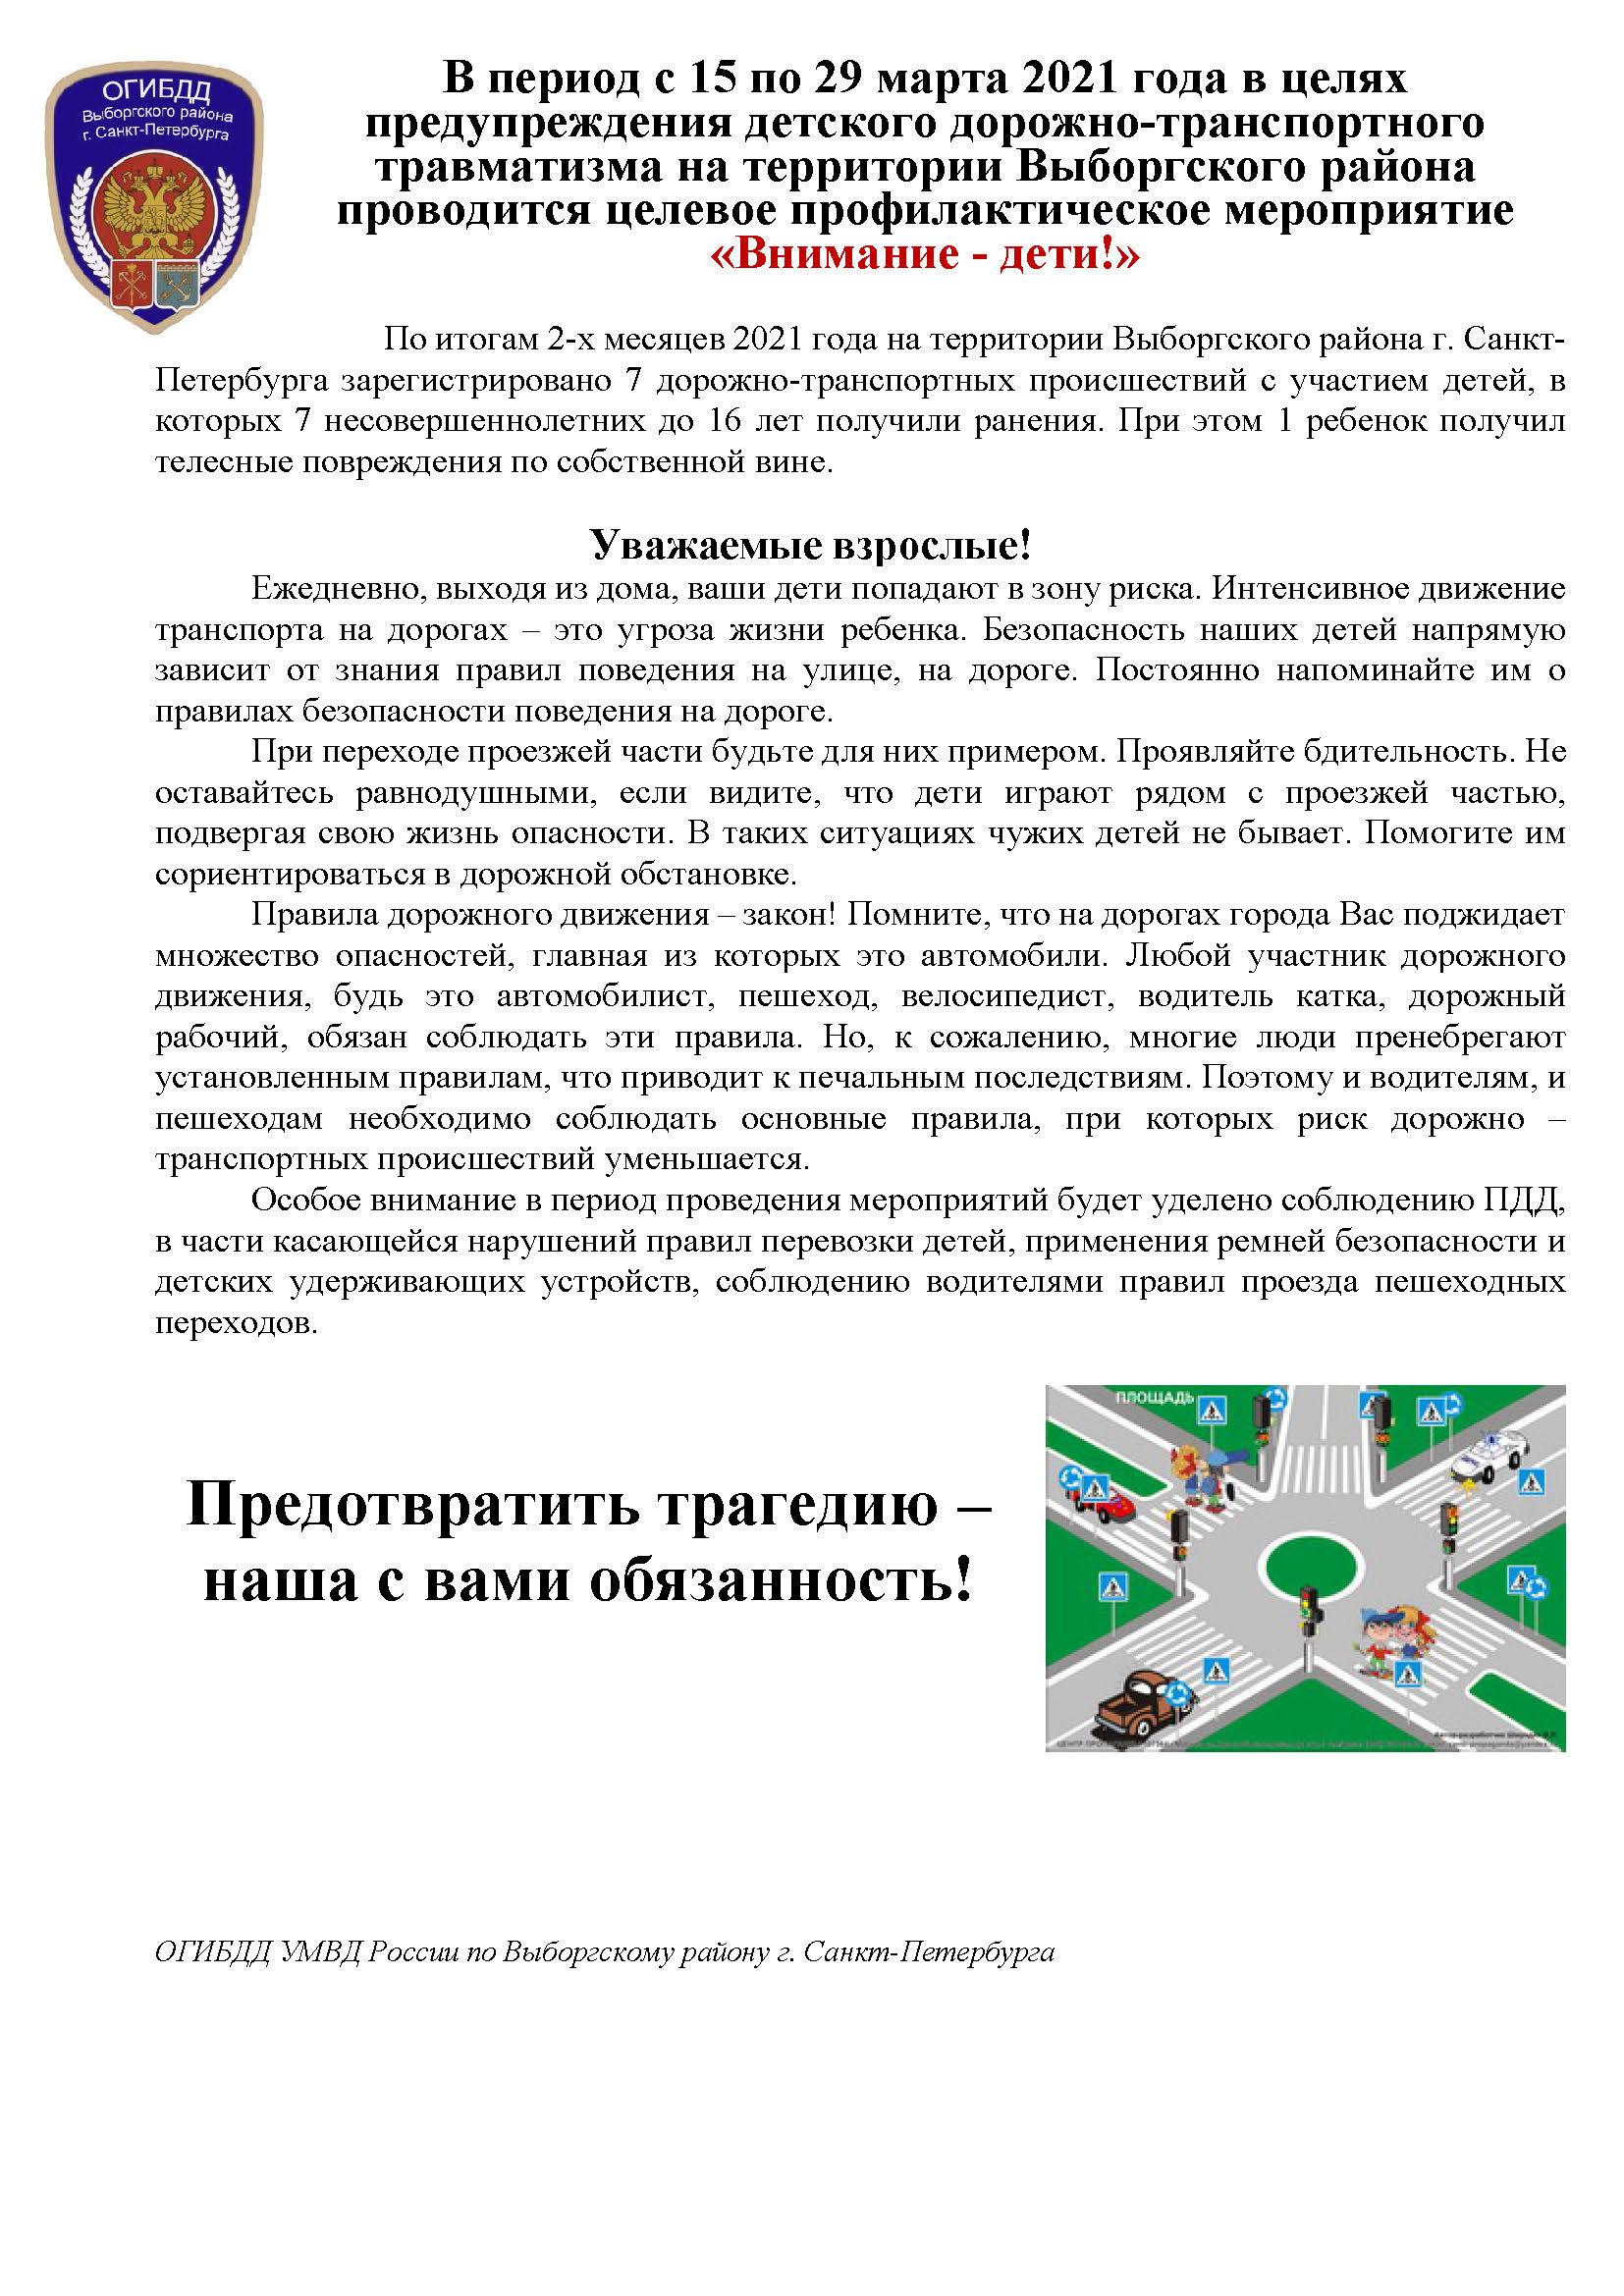 https://i.ibb.co/gVhCcm2/image.jpg